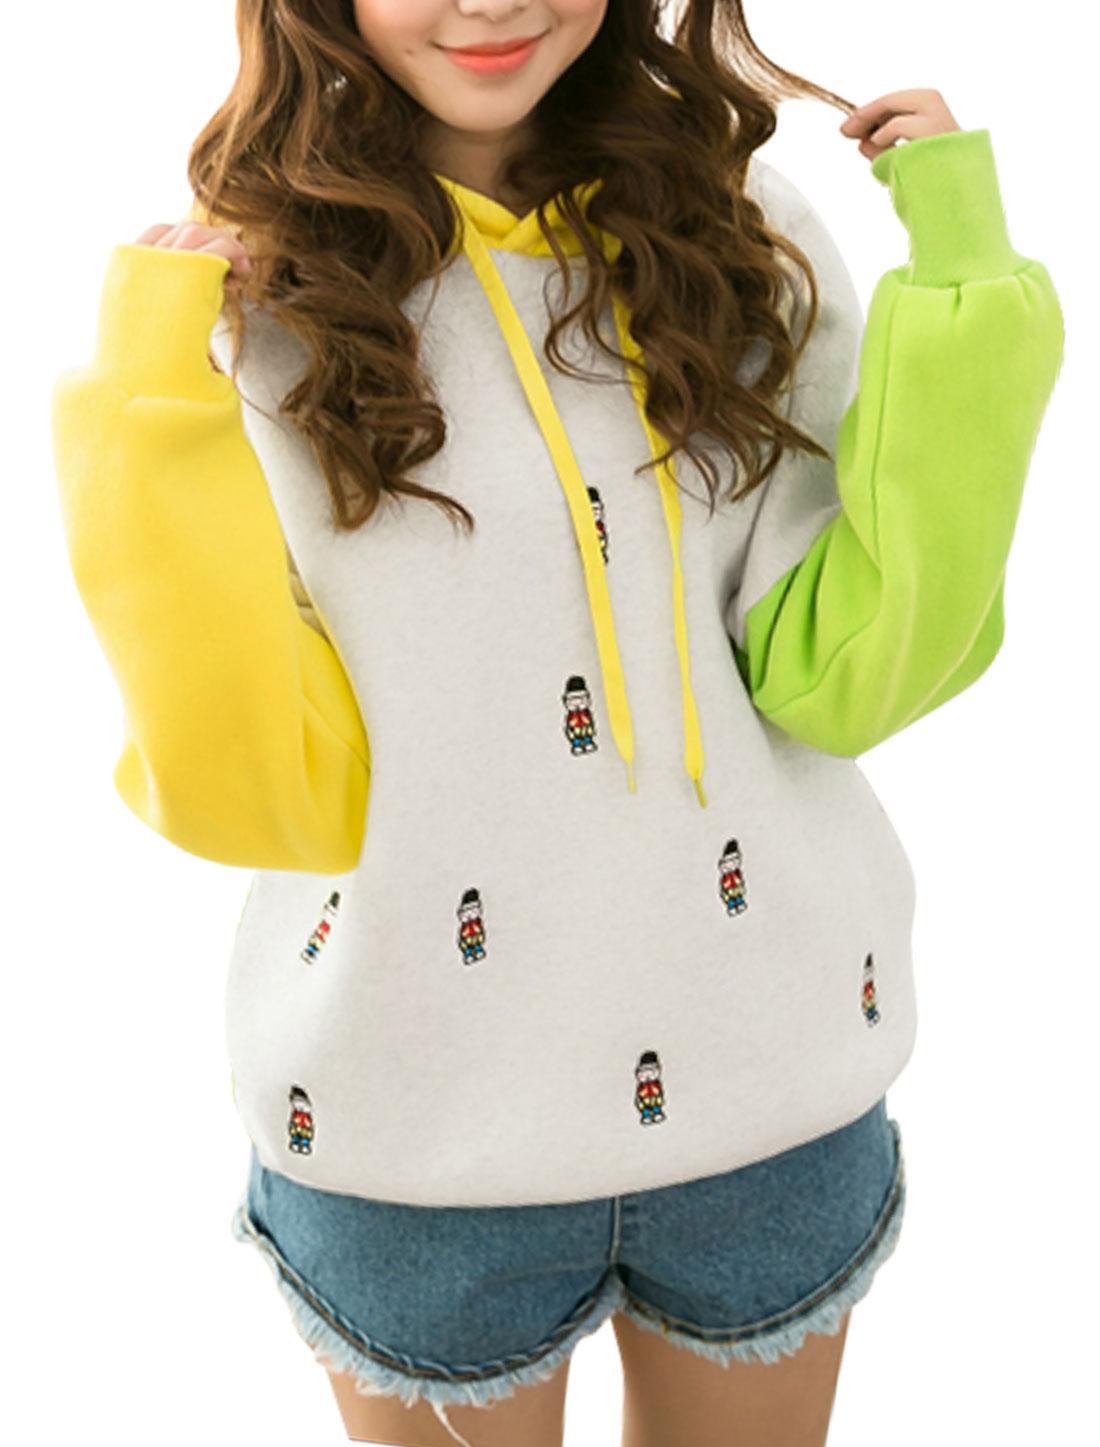 Women Hooded Batwing Sleeves Color Blocking Sweatshirt Yellow Green Yellow XS